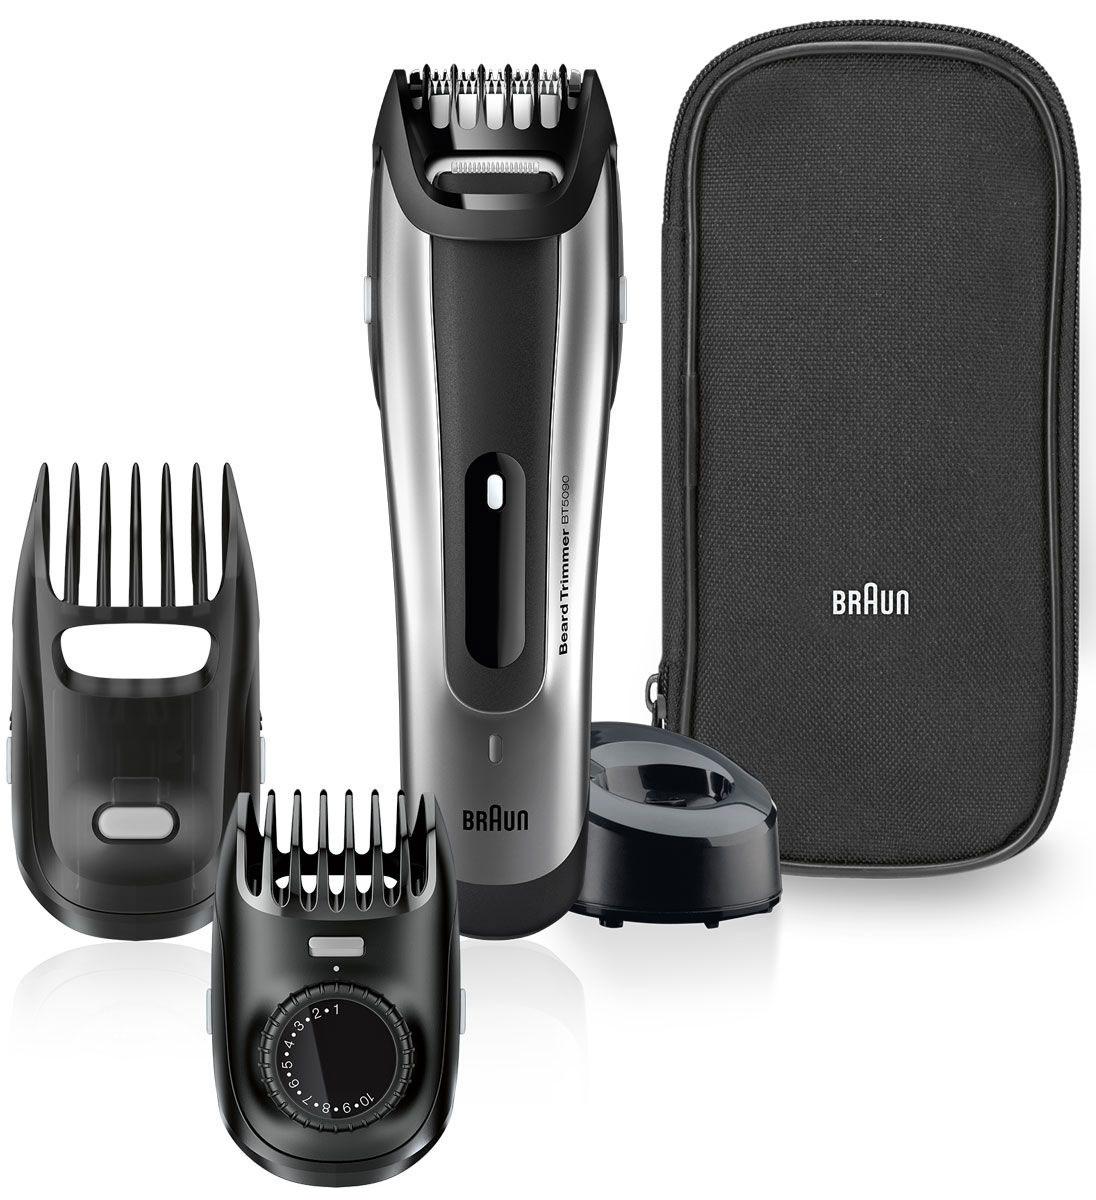 Braun BT 5090 триммер для бороды - Триммеры